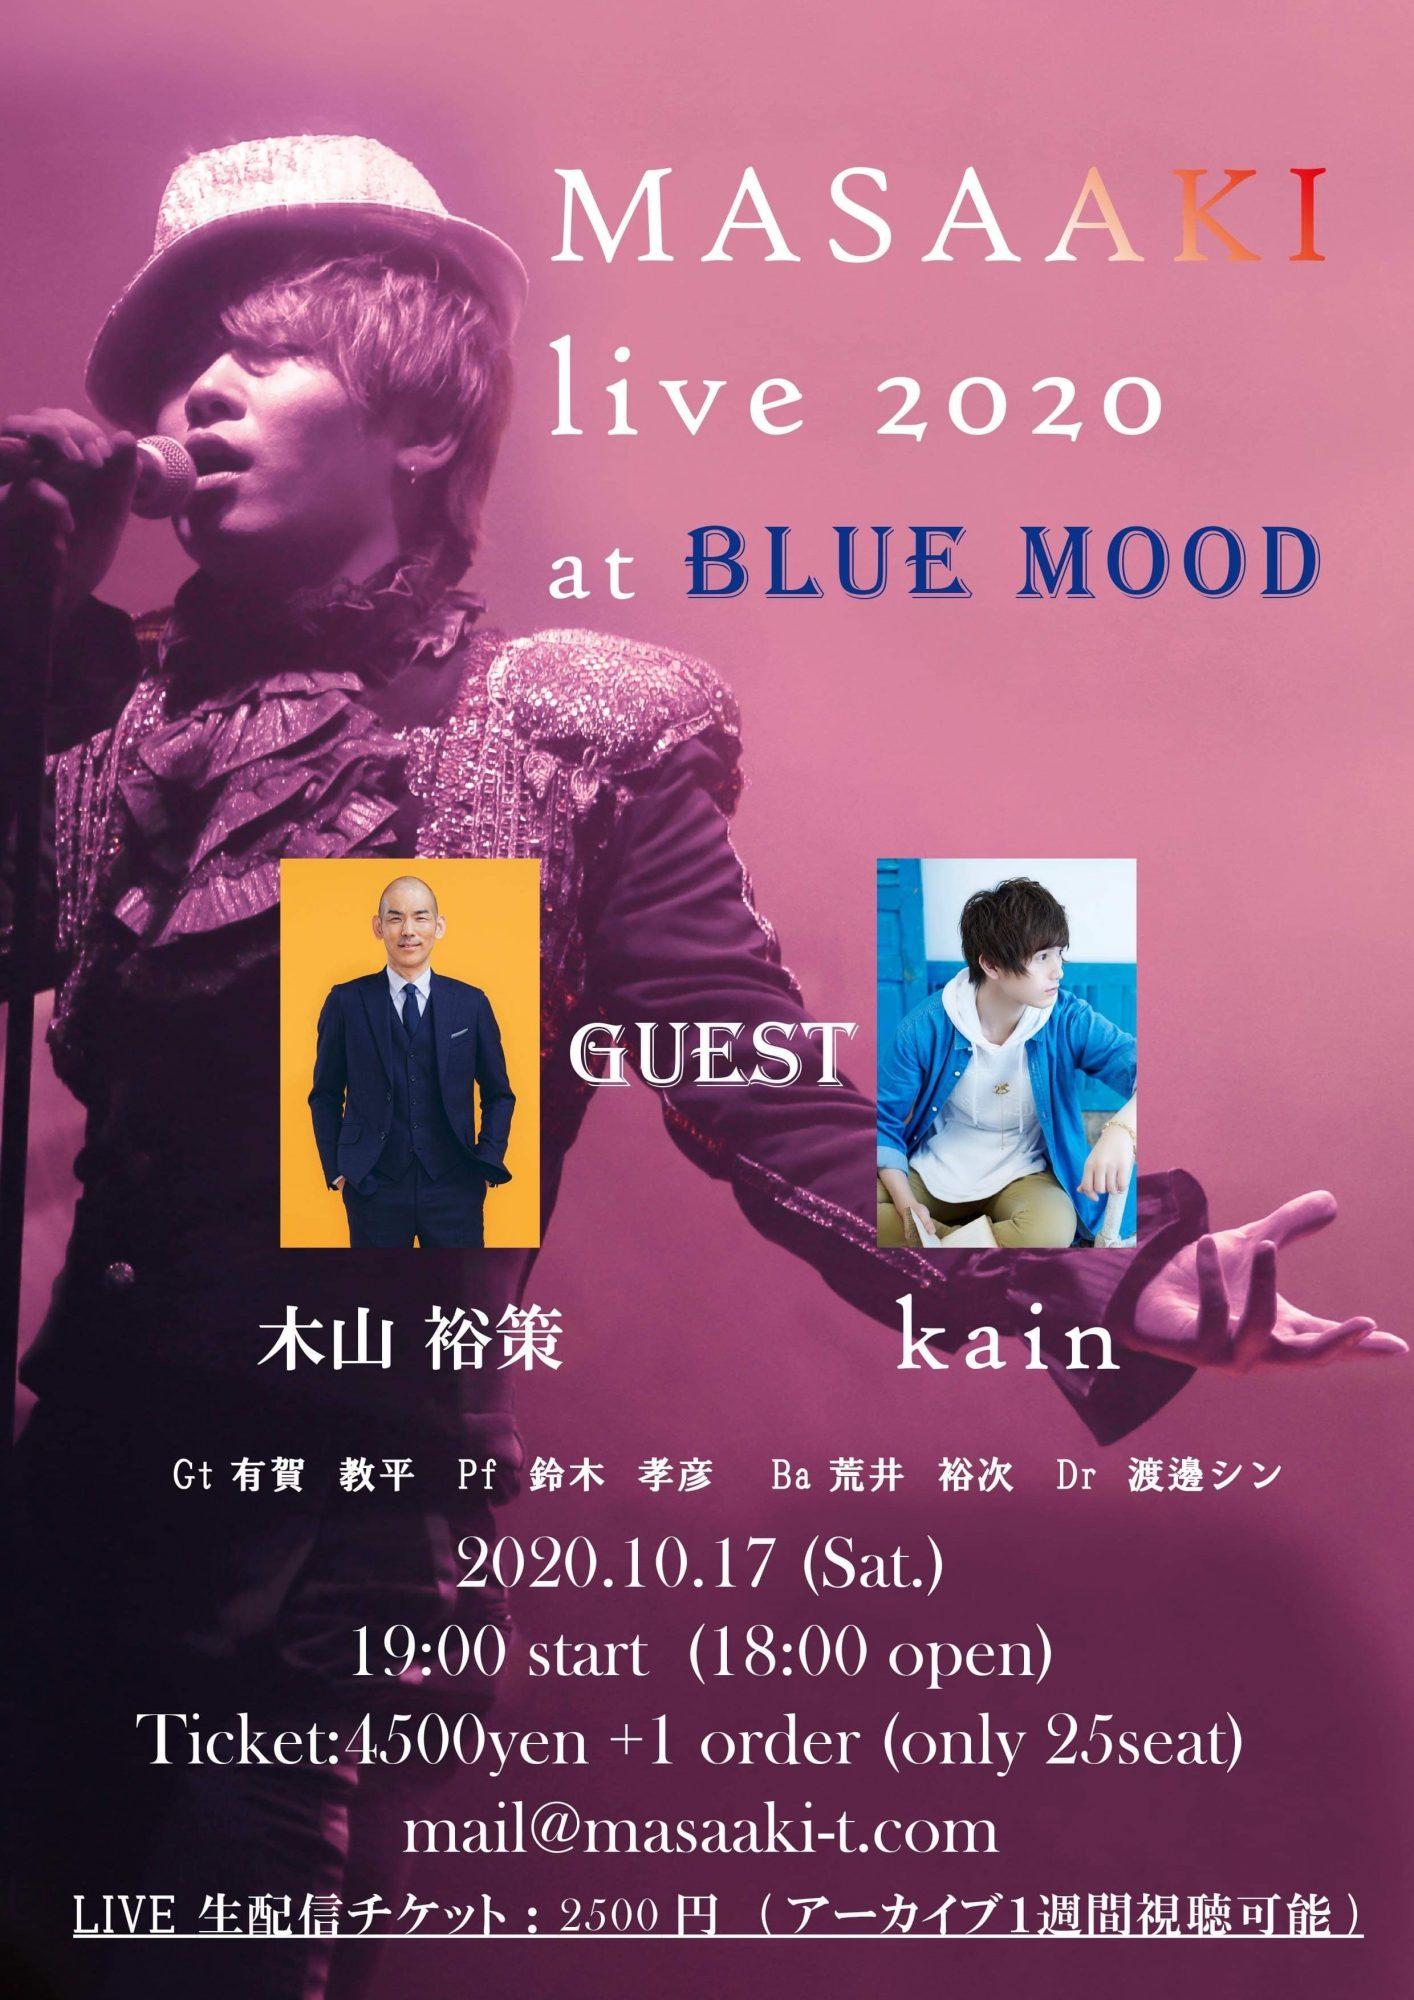 Masaaki solo concert 2020